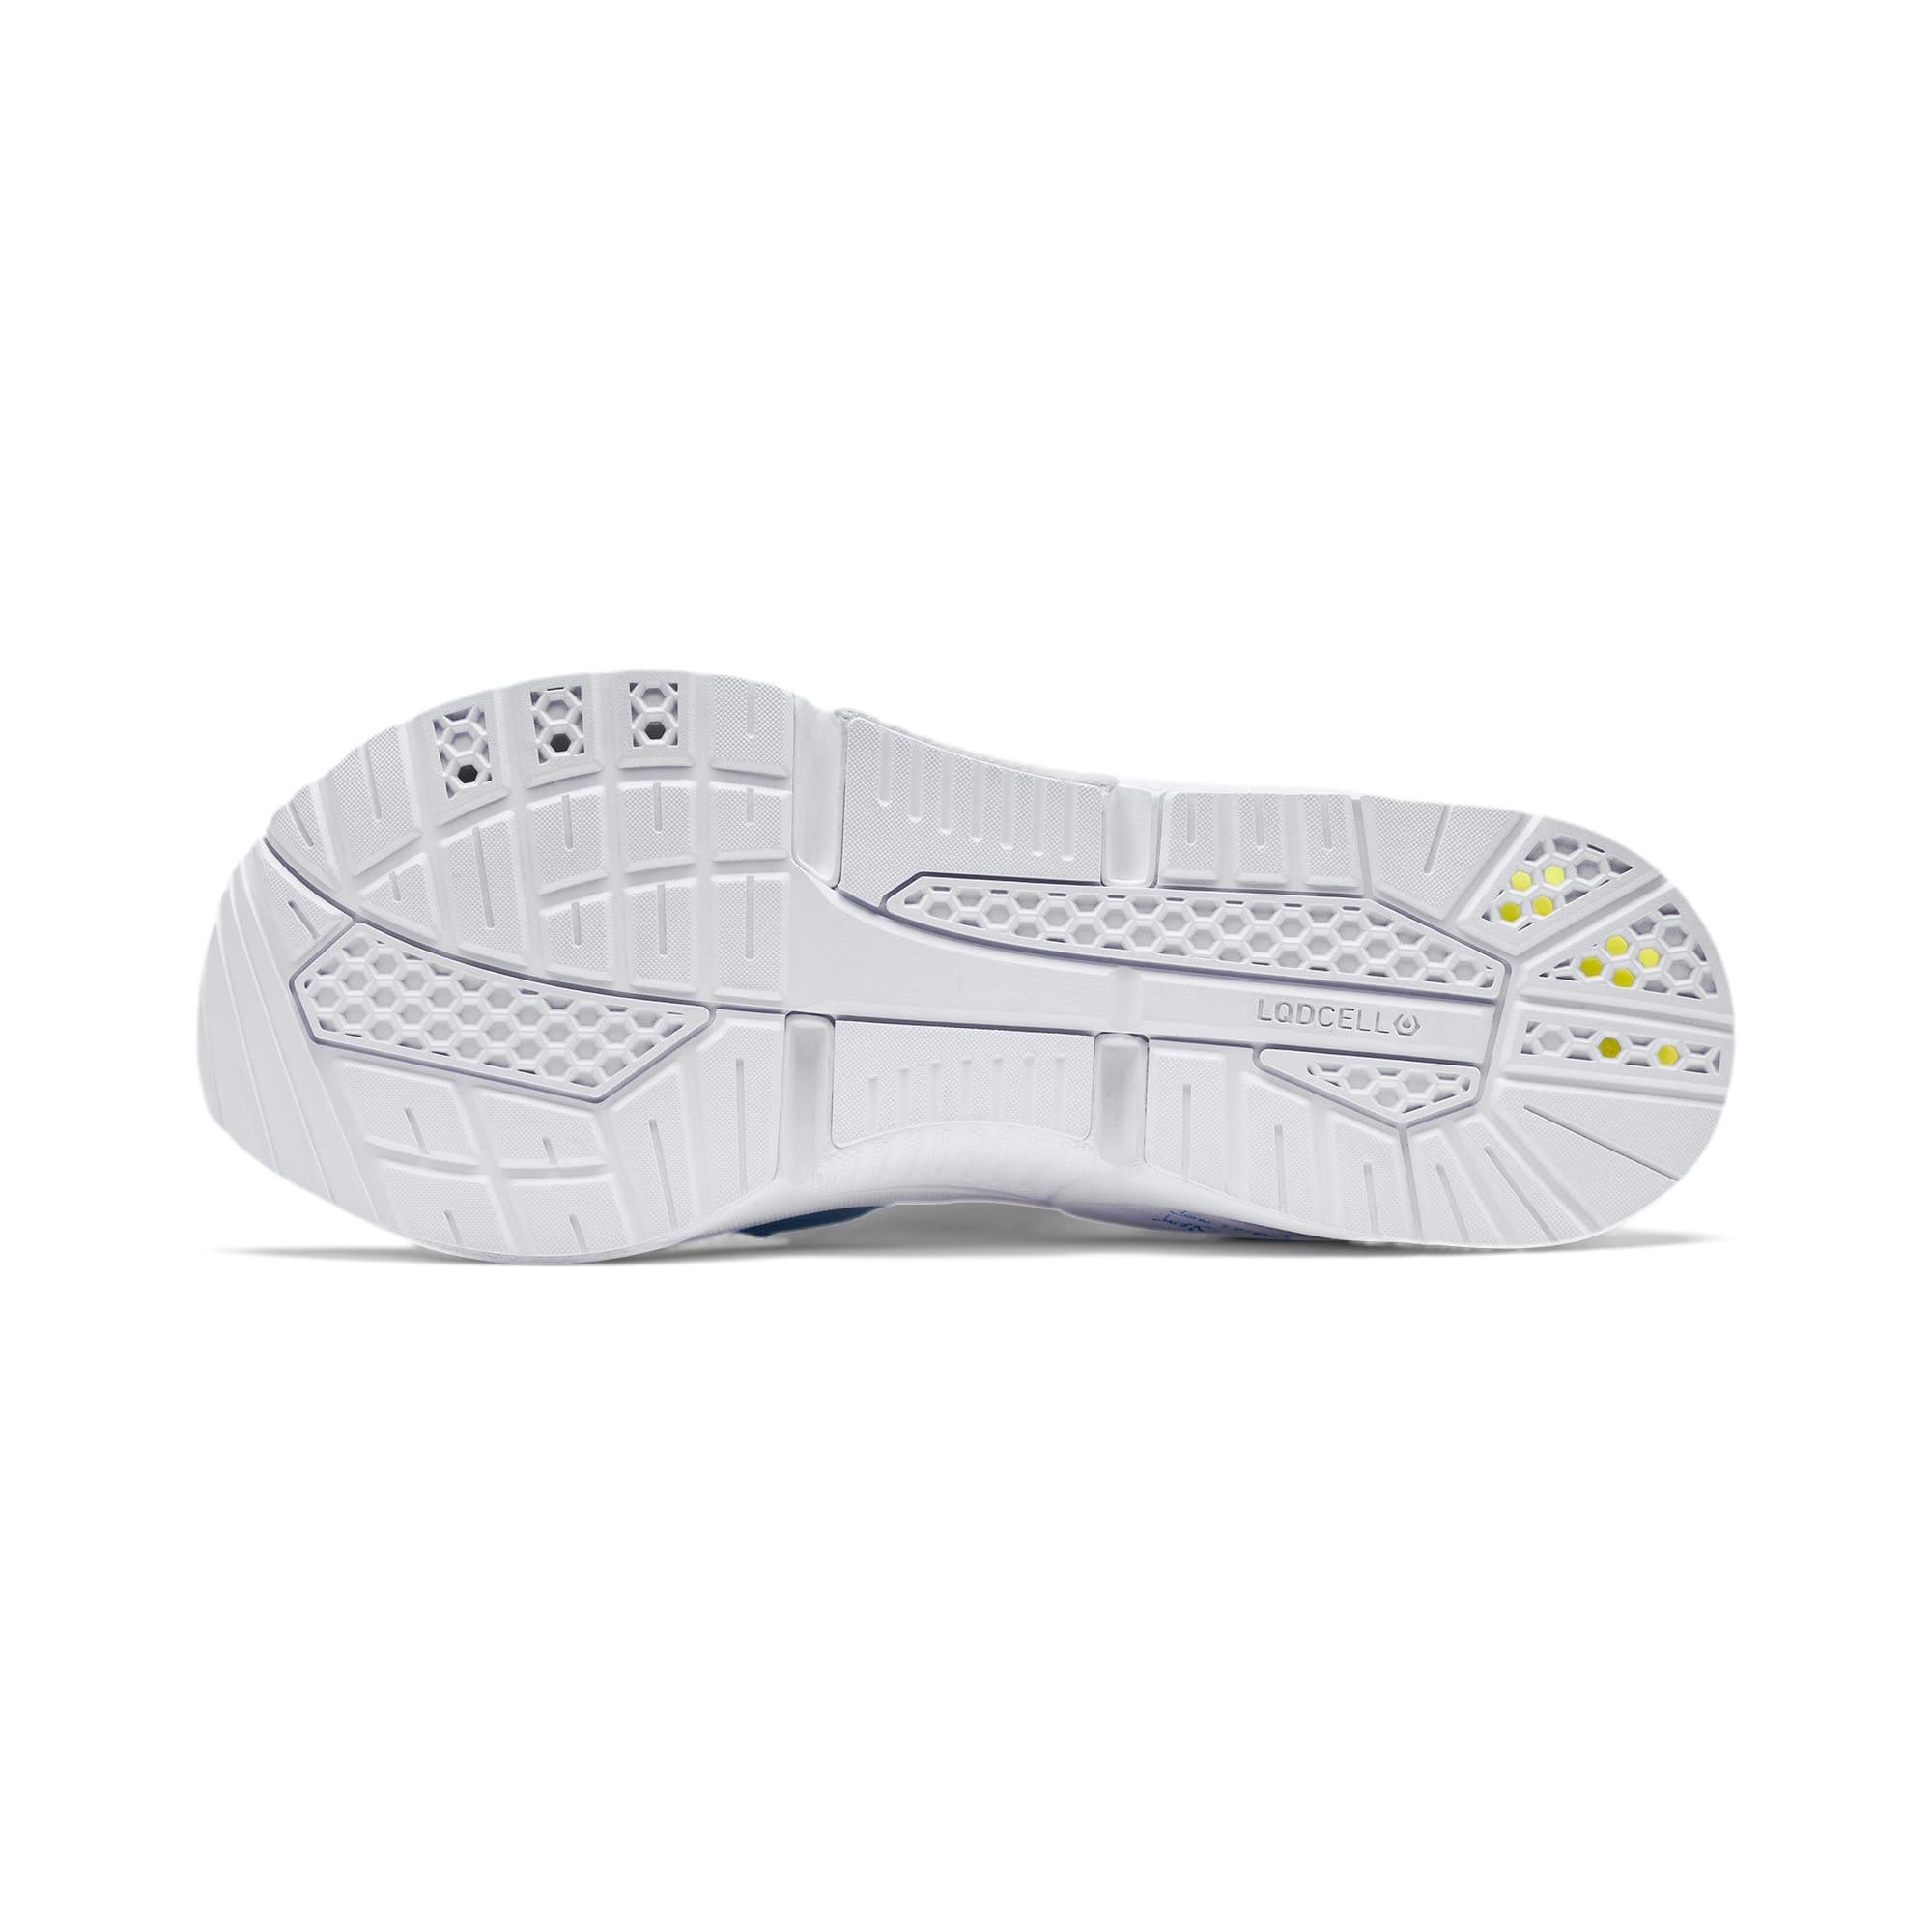 Thumbnail 5 of LQDCELL Optic Sheer Men's Training Shoes, Puma White, medium